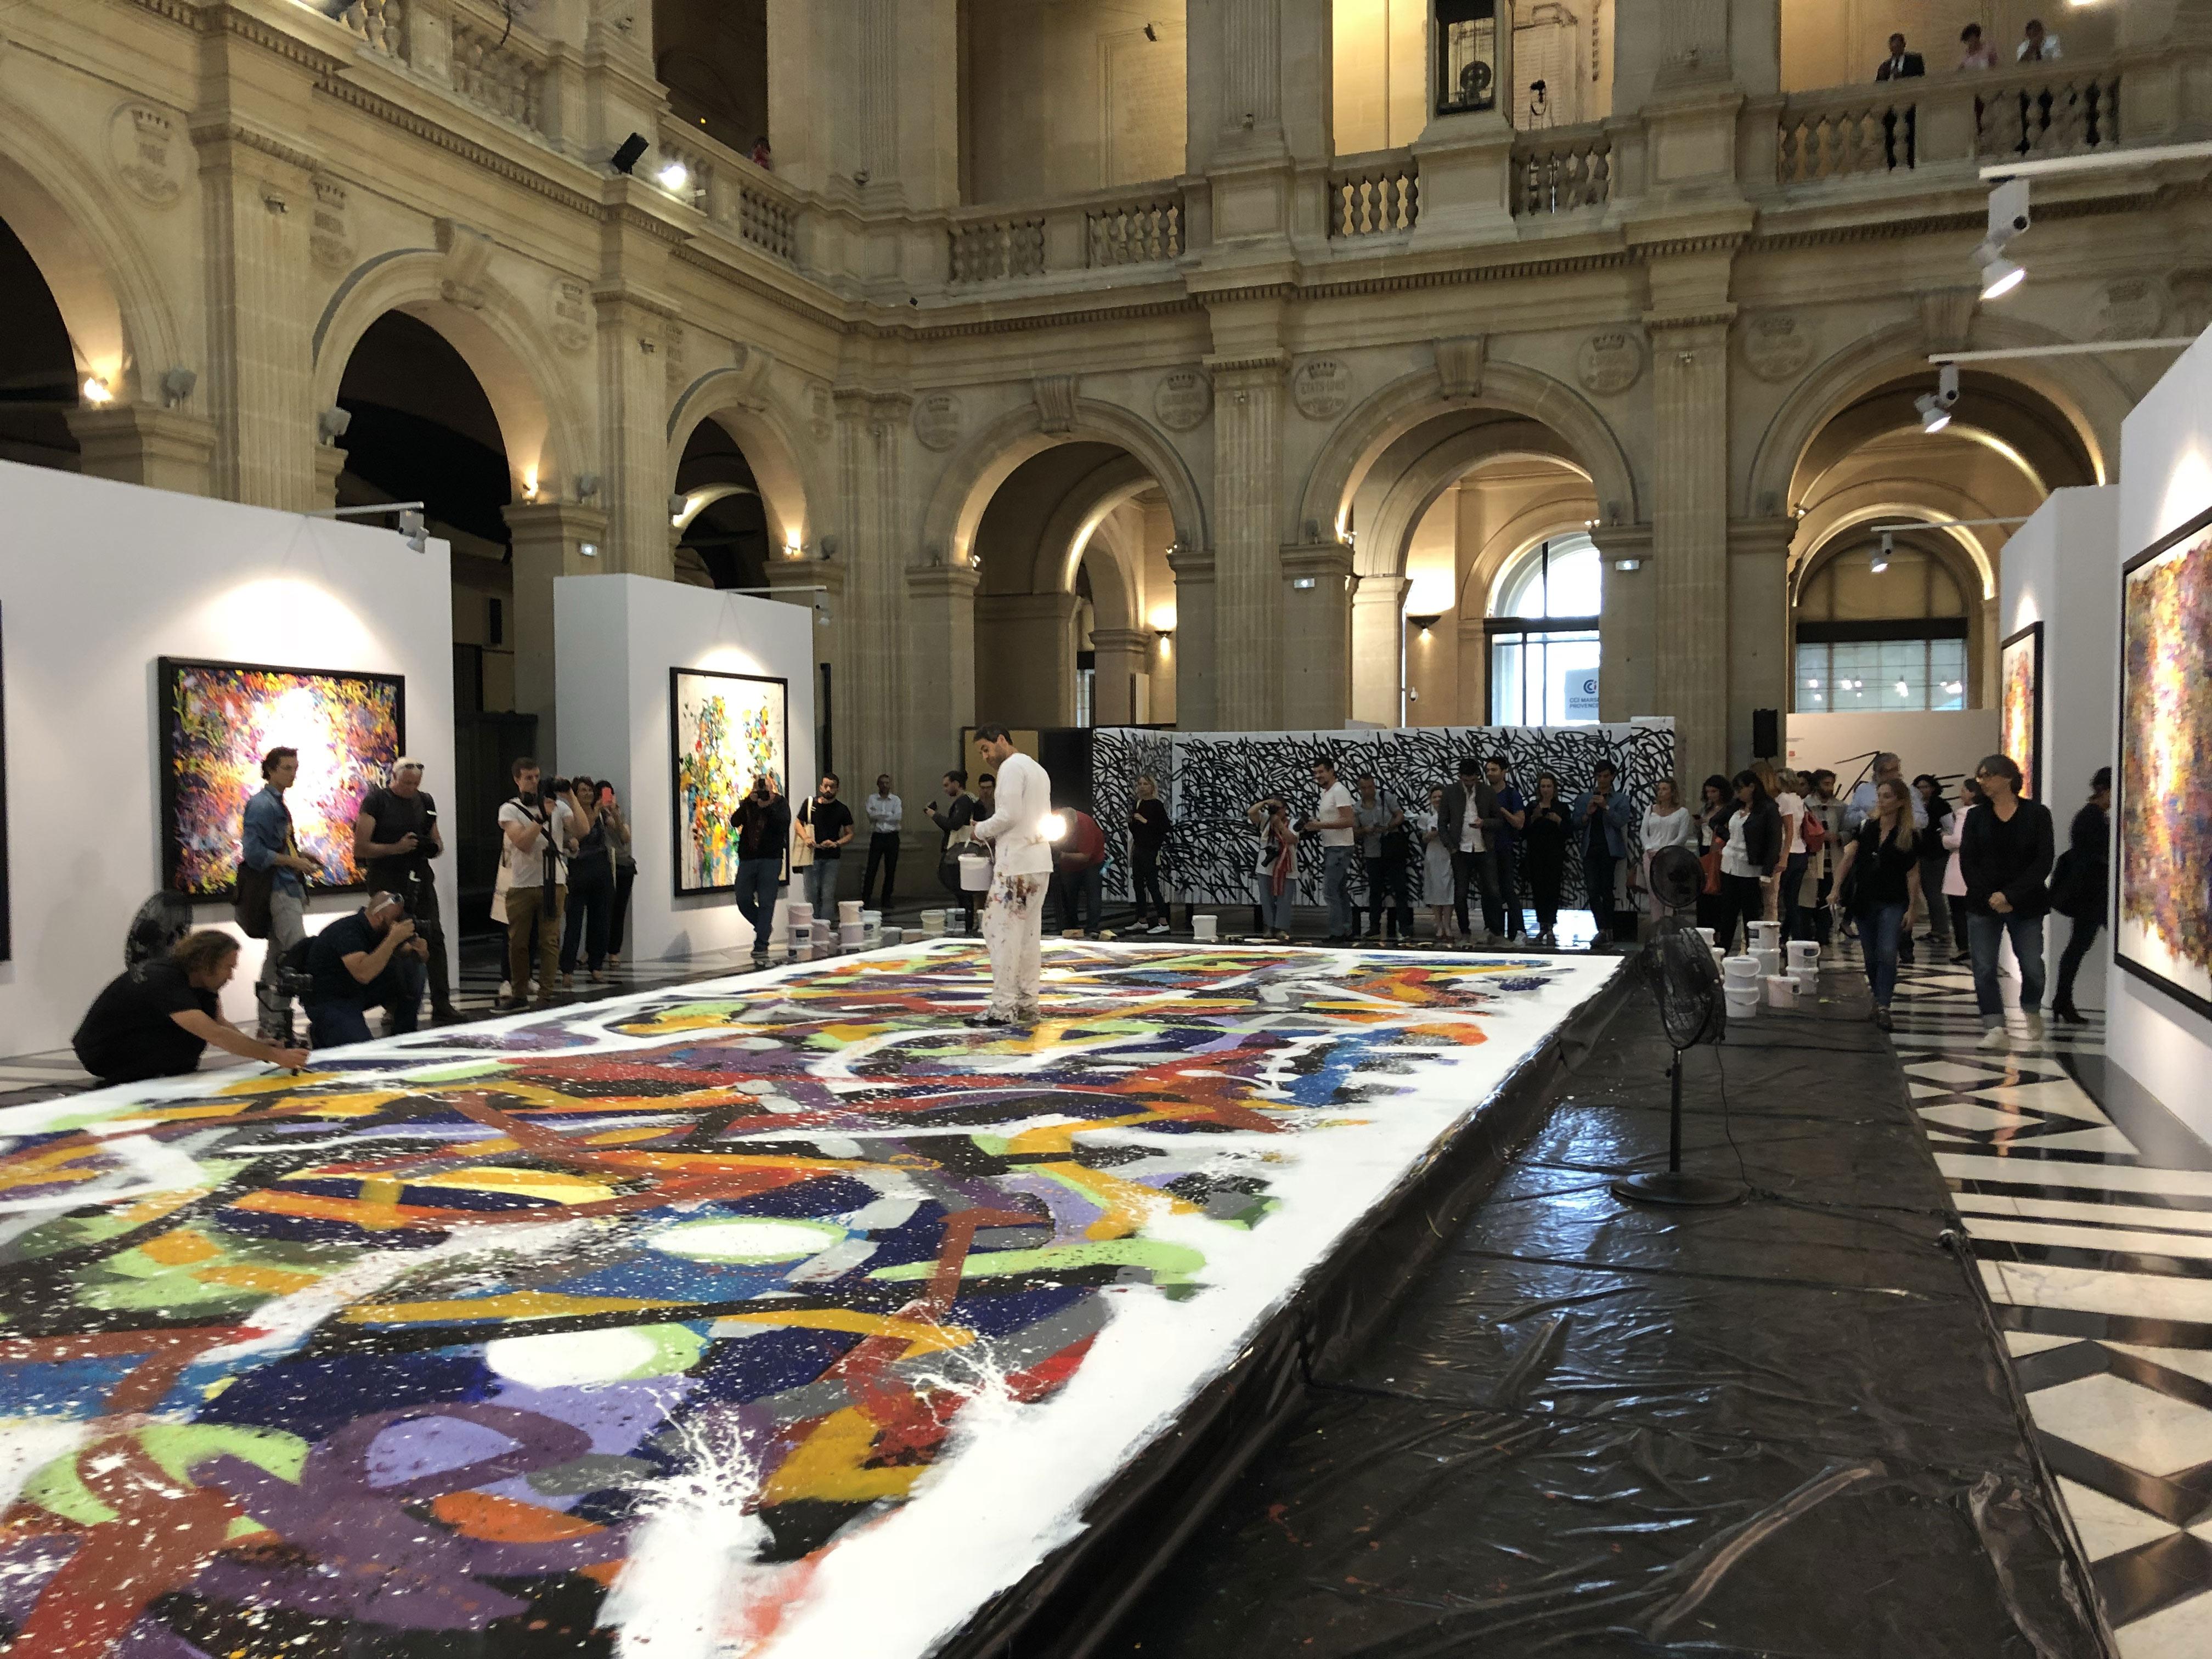 JonOne-bache-peinture-art-contemporain-exposition-expo-decoration-deco-toile-marseille-palaisdelabourse-audiovisuel-aucop-abstracted-love